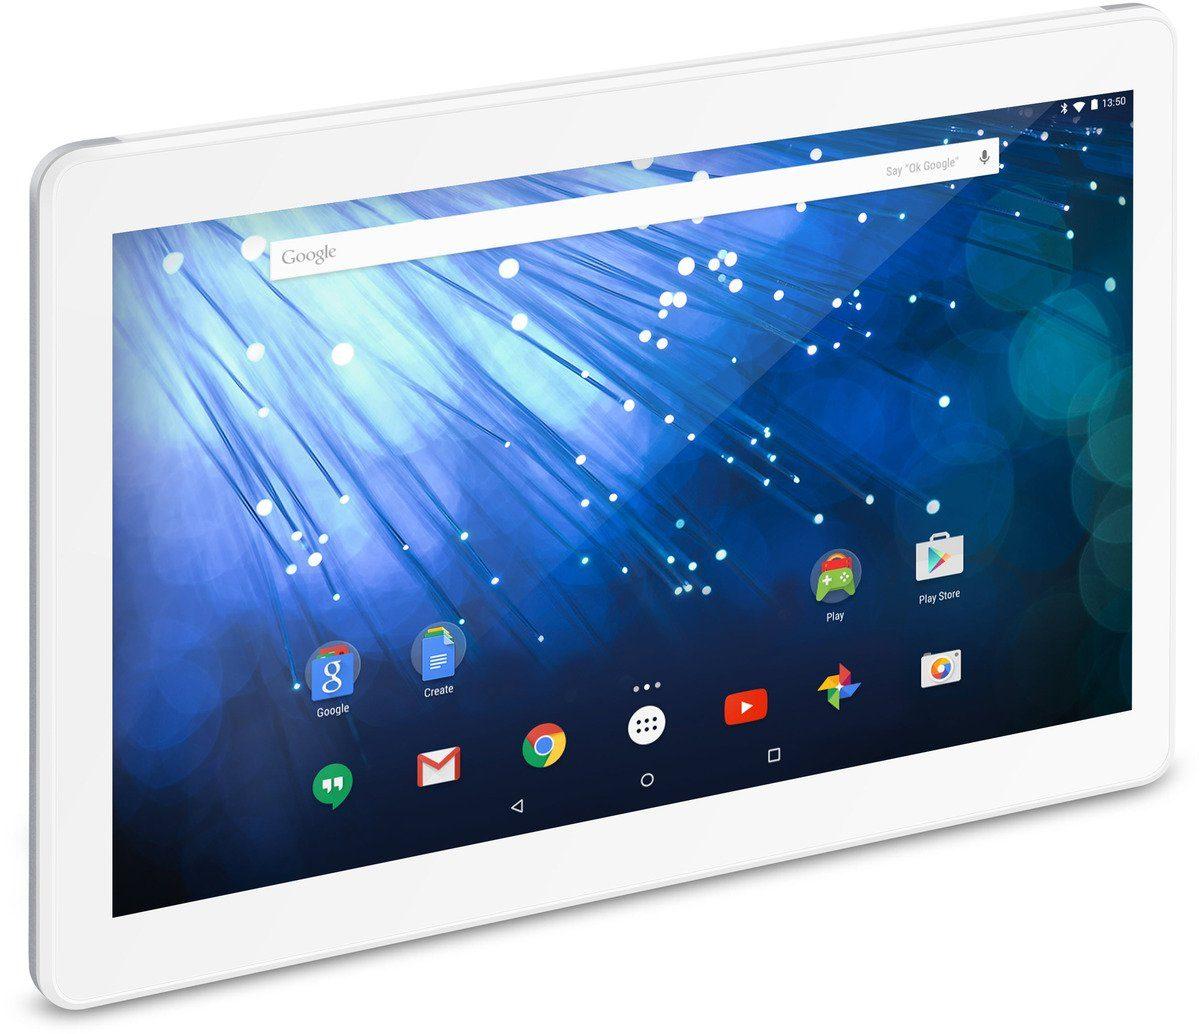 TrekStor Tablet »SurfTab breeze 10.1 quad 3G«